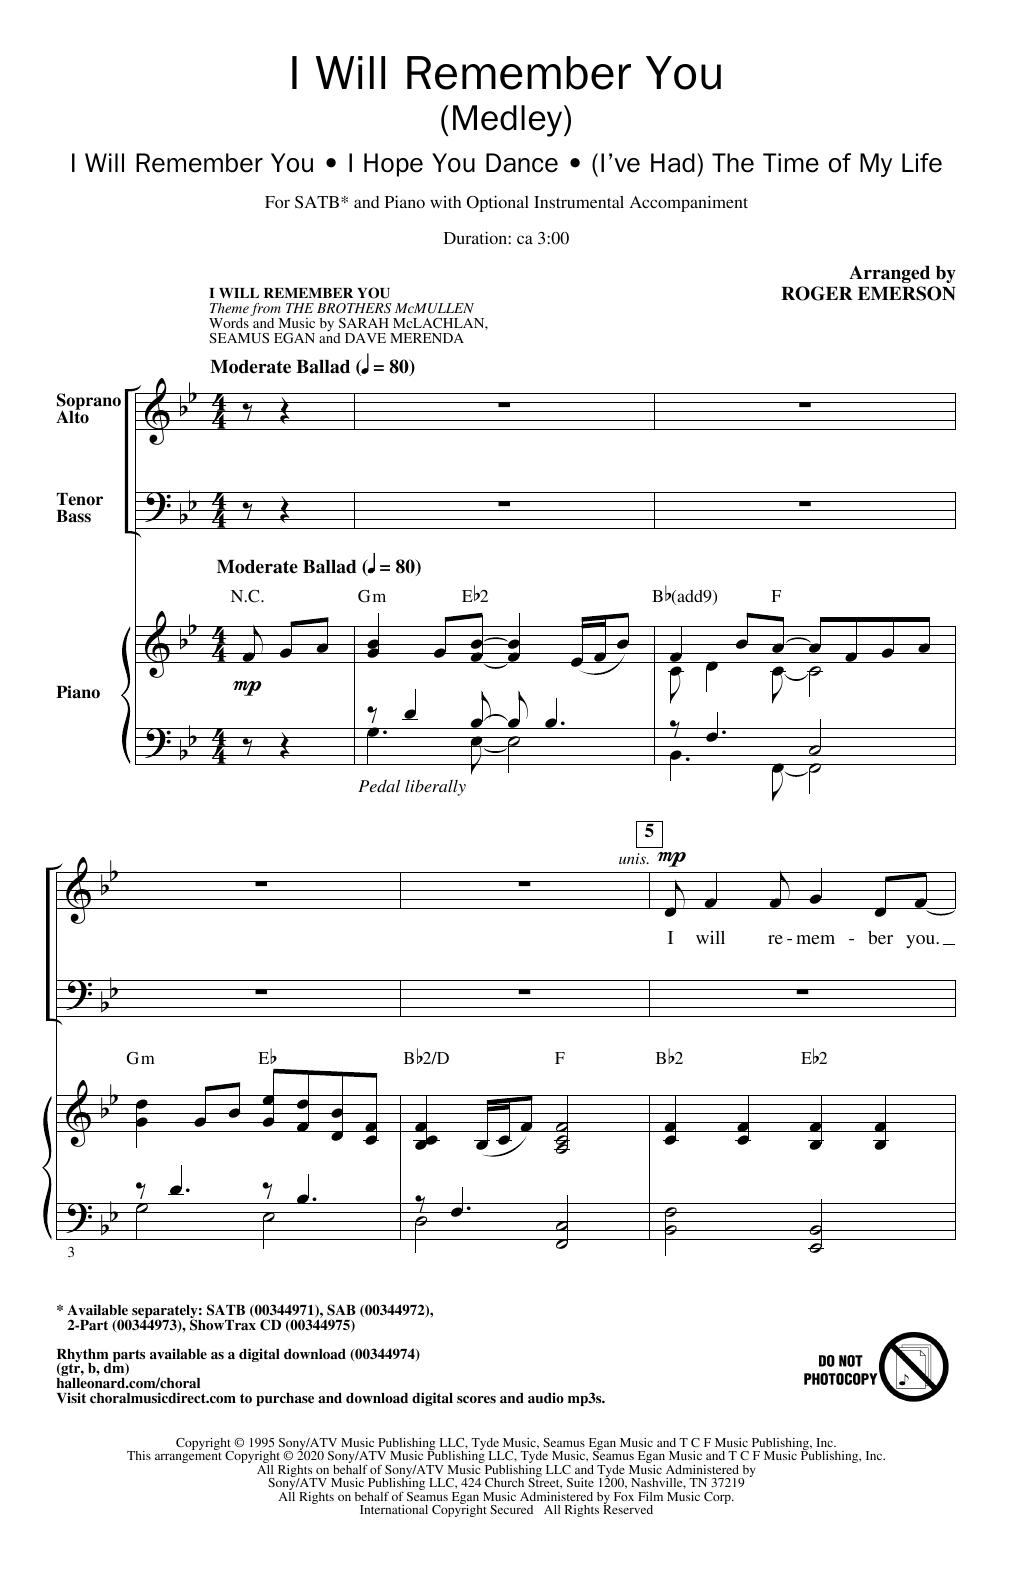 I Will Remember You (Medley) (SATB Choir)